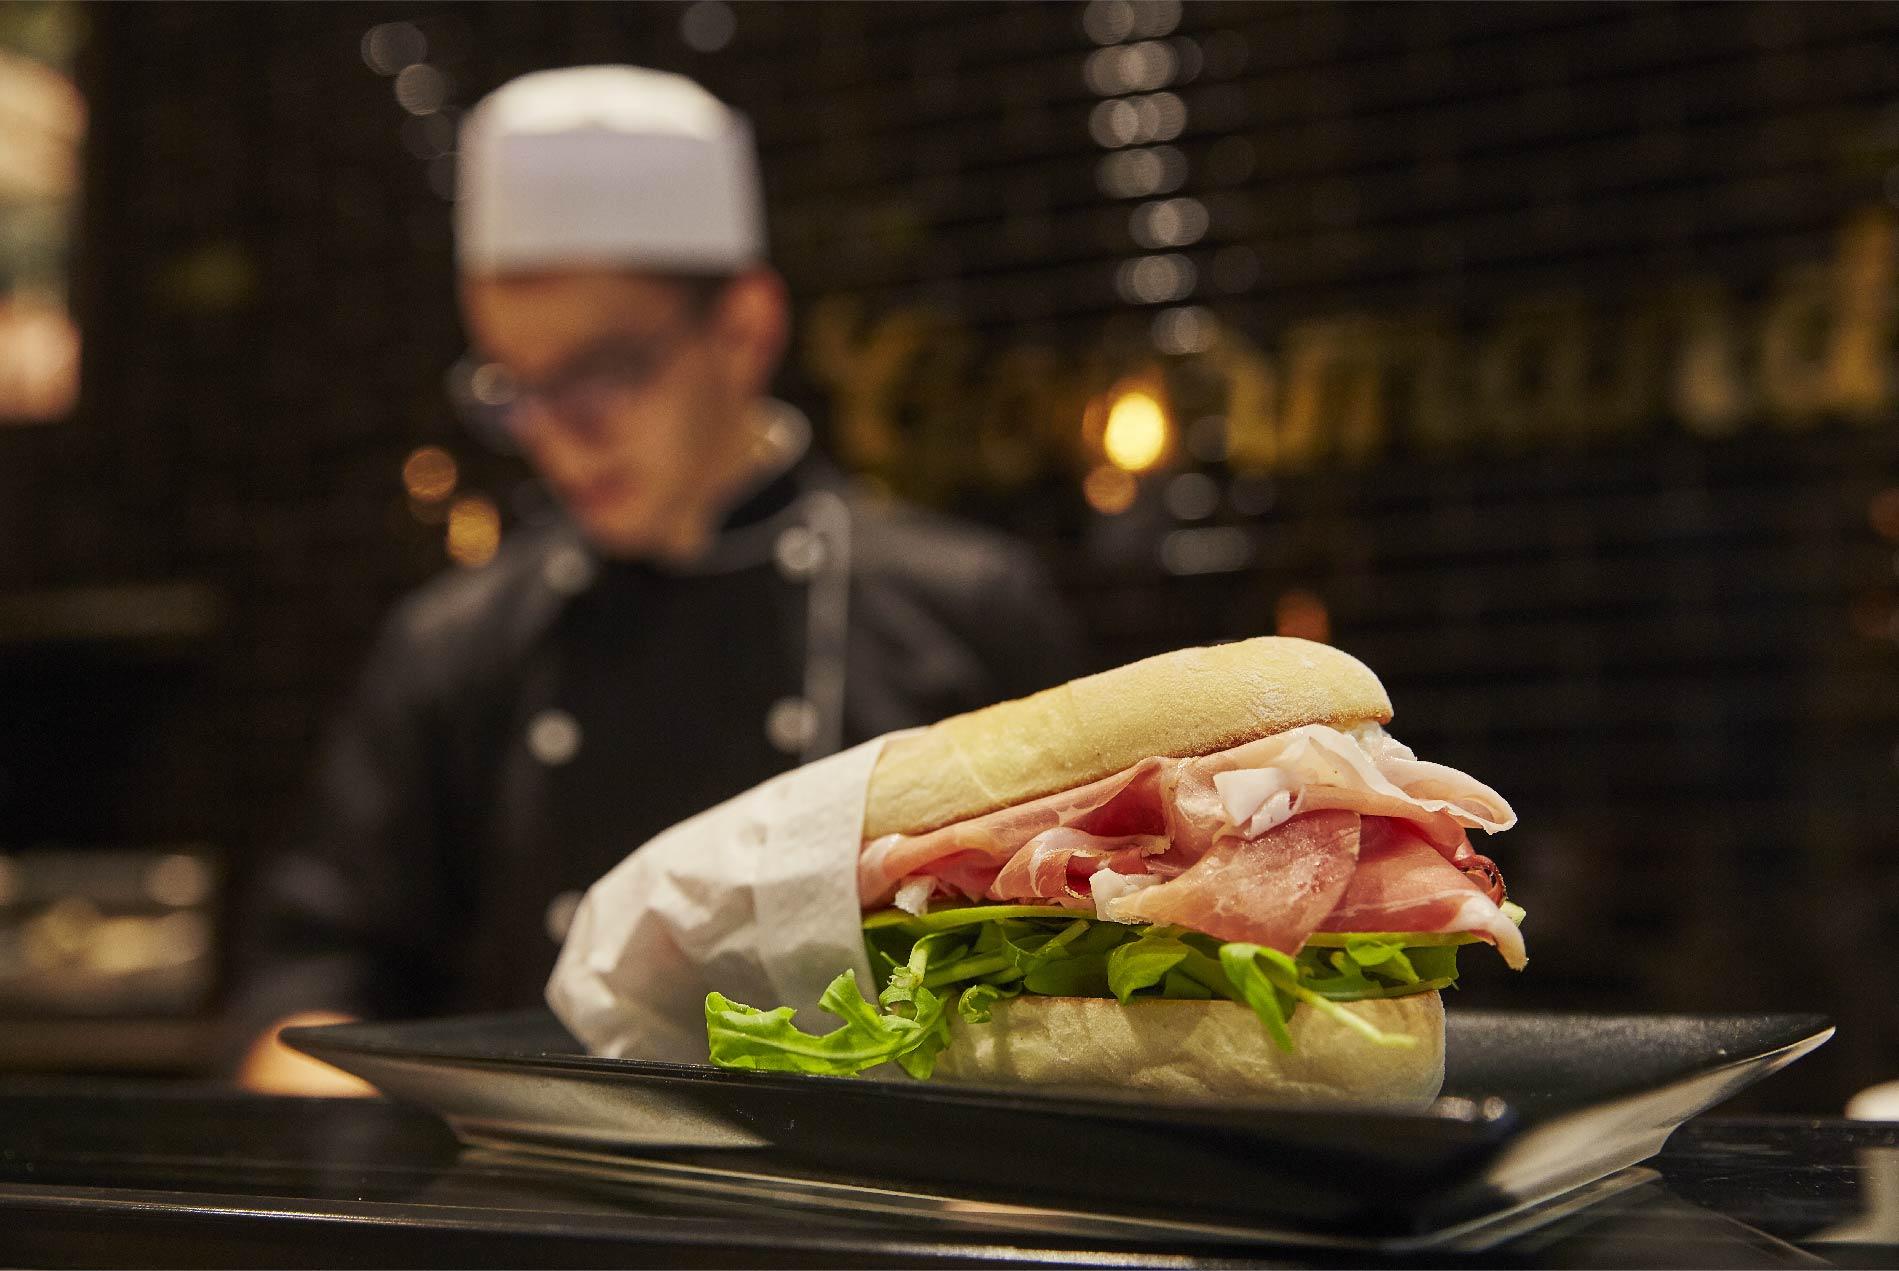 07-Gourmand-panino-autore-sandwich